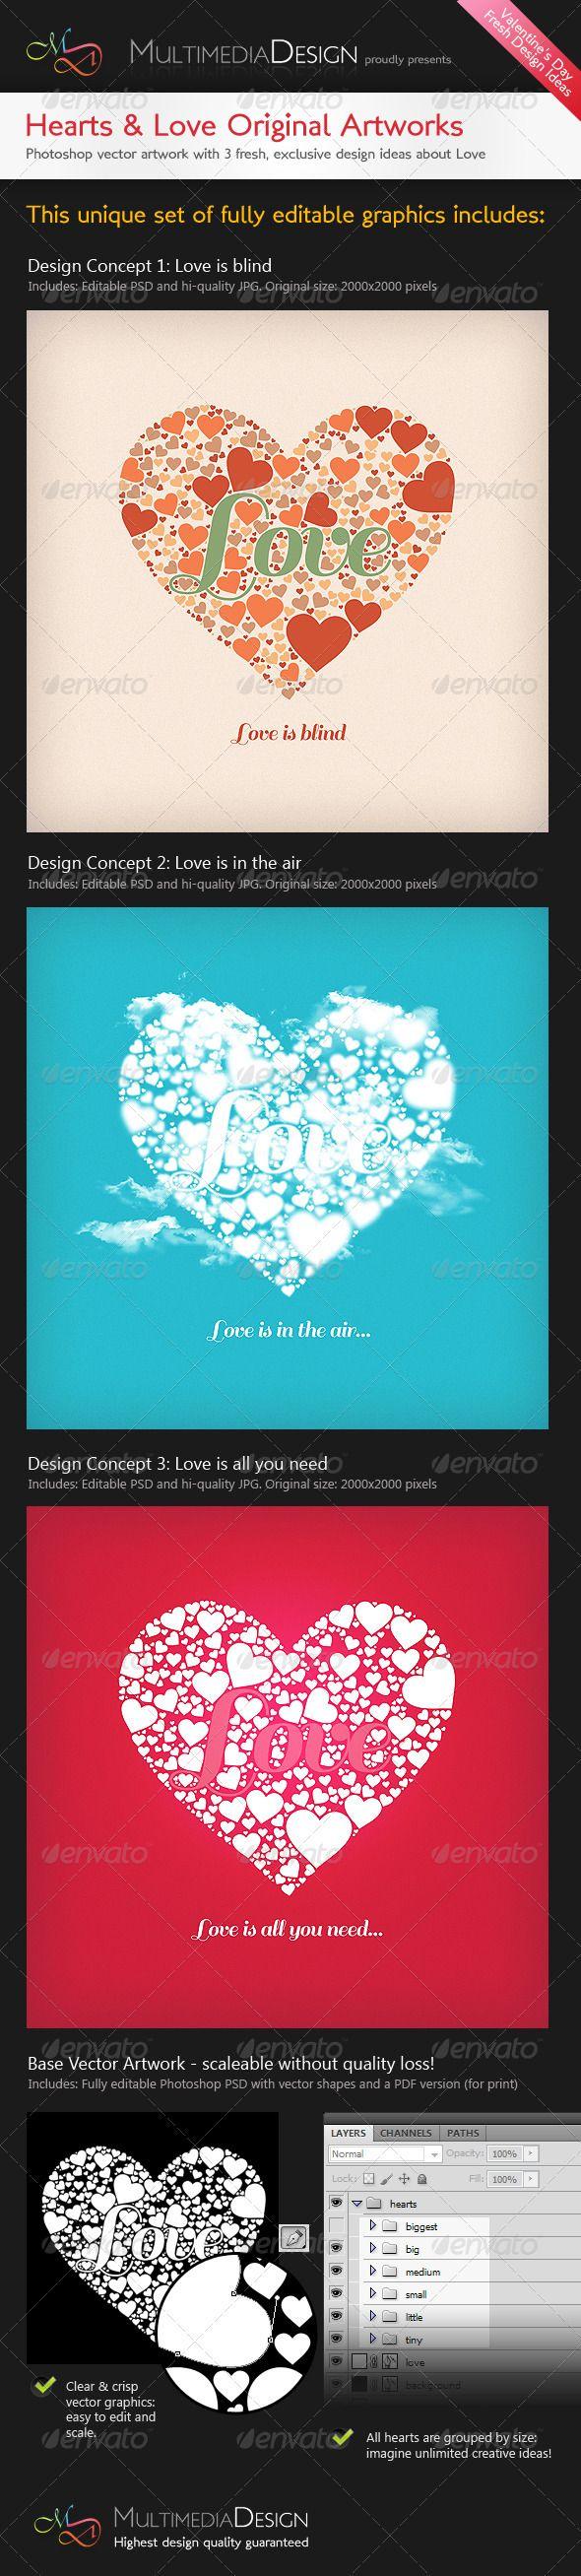 19 Best Grafika Images On Pinterest Info Graphics Color File Type Photoshop Psd Image Size 3400 X 2800 Resolution Valentines Heartslove Original Typography Designs